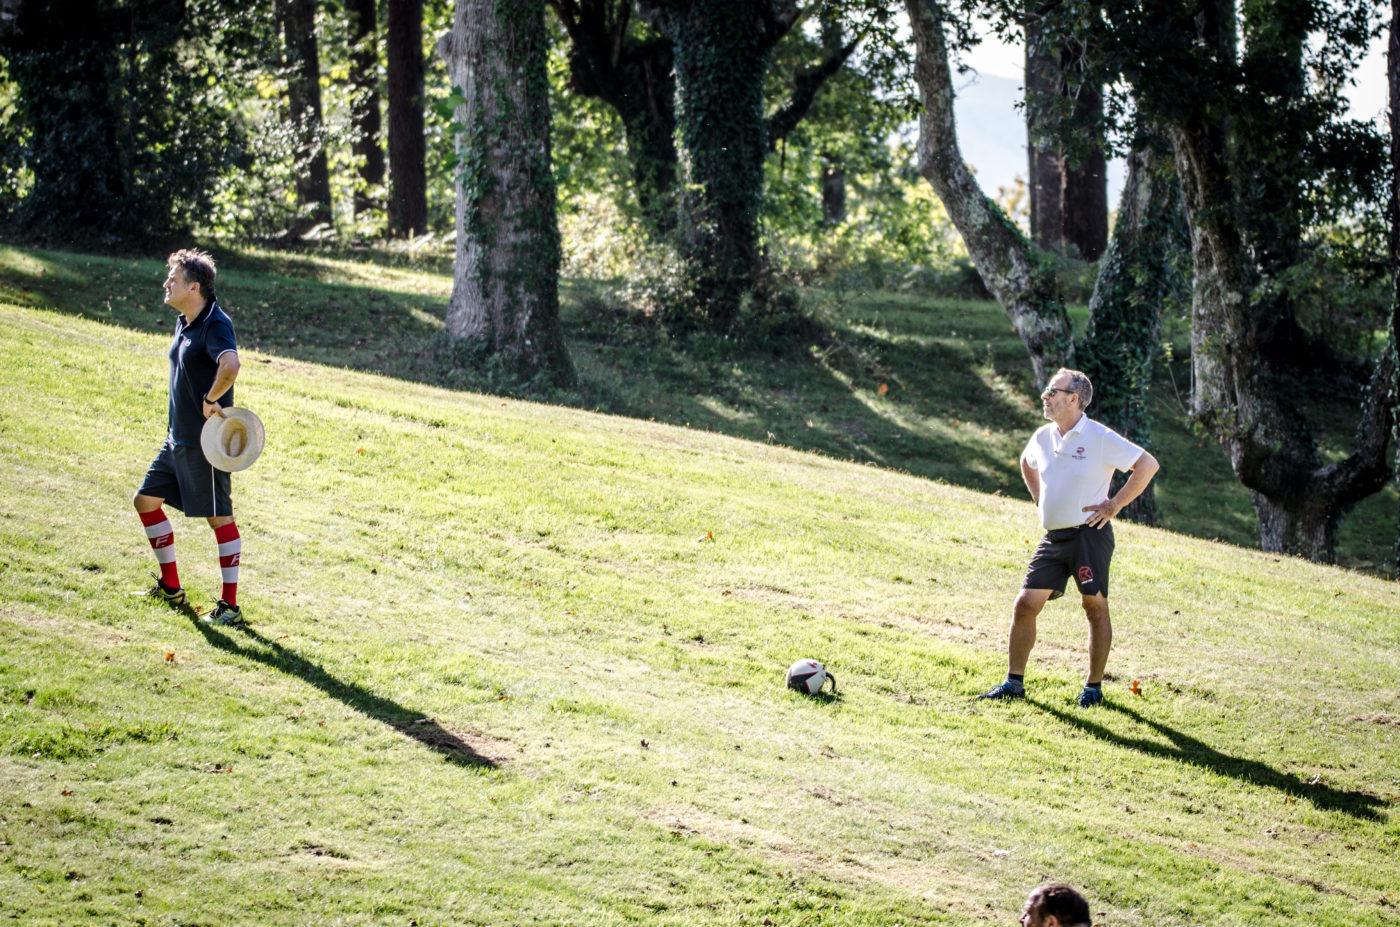 Événement Rugby Golf IRPB 2019 Chantaco Inter réseau Pays basque Agence Erronda Horesto Formation